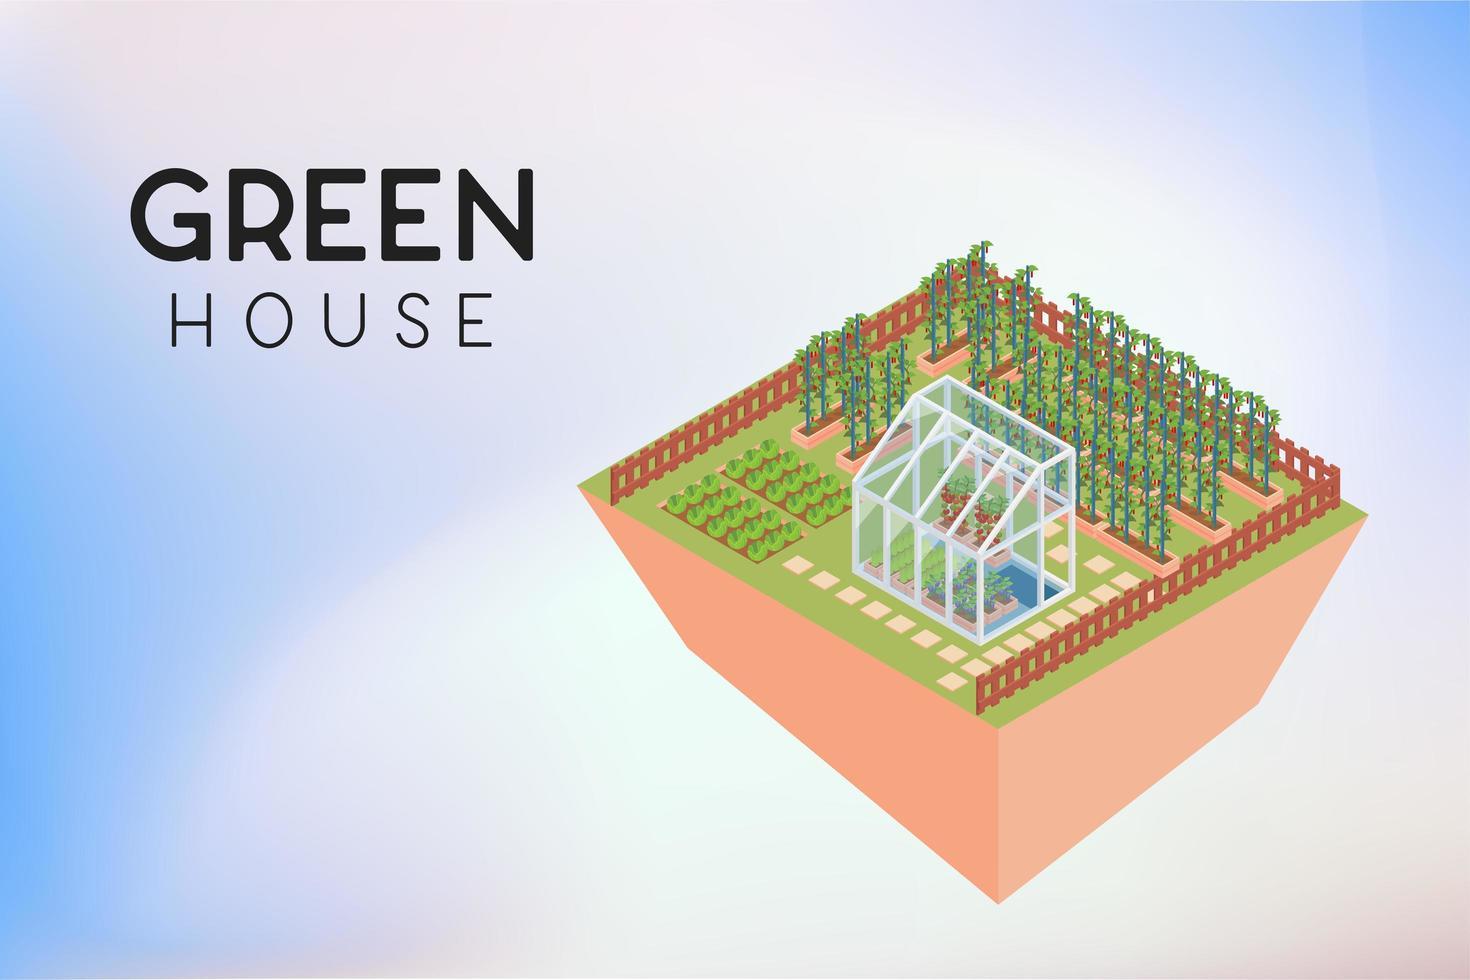 Greenhouse Around Fruit Plants Garden and Board Field vector